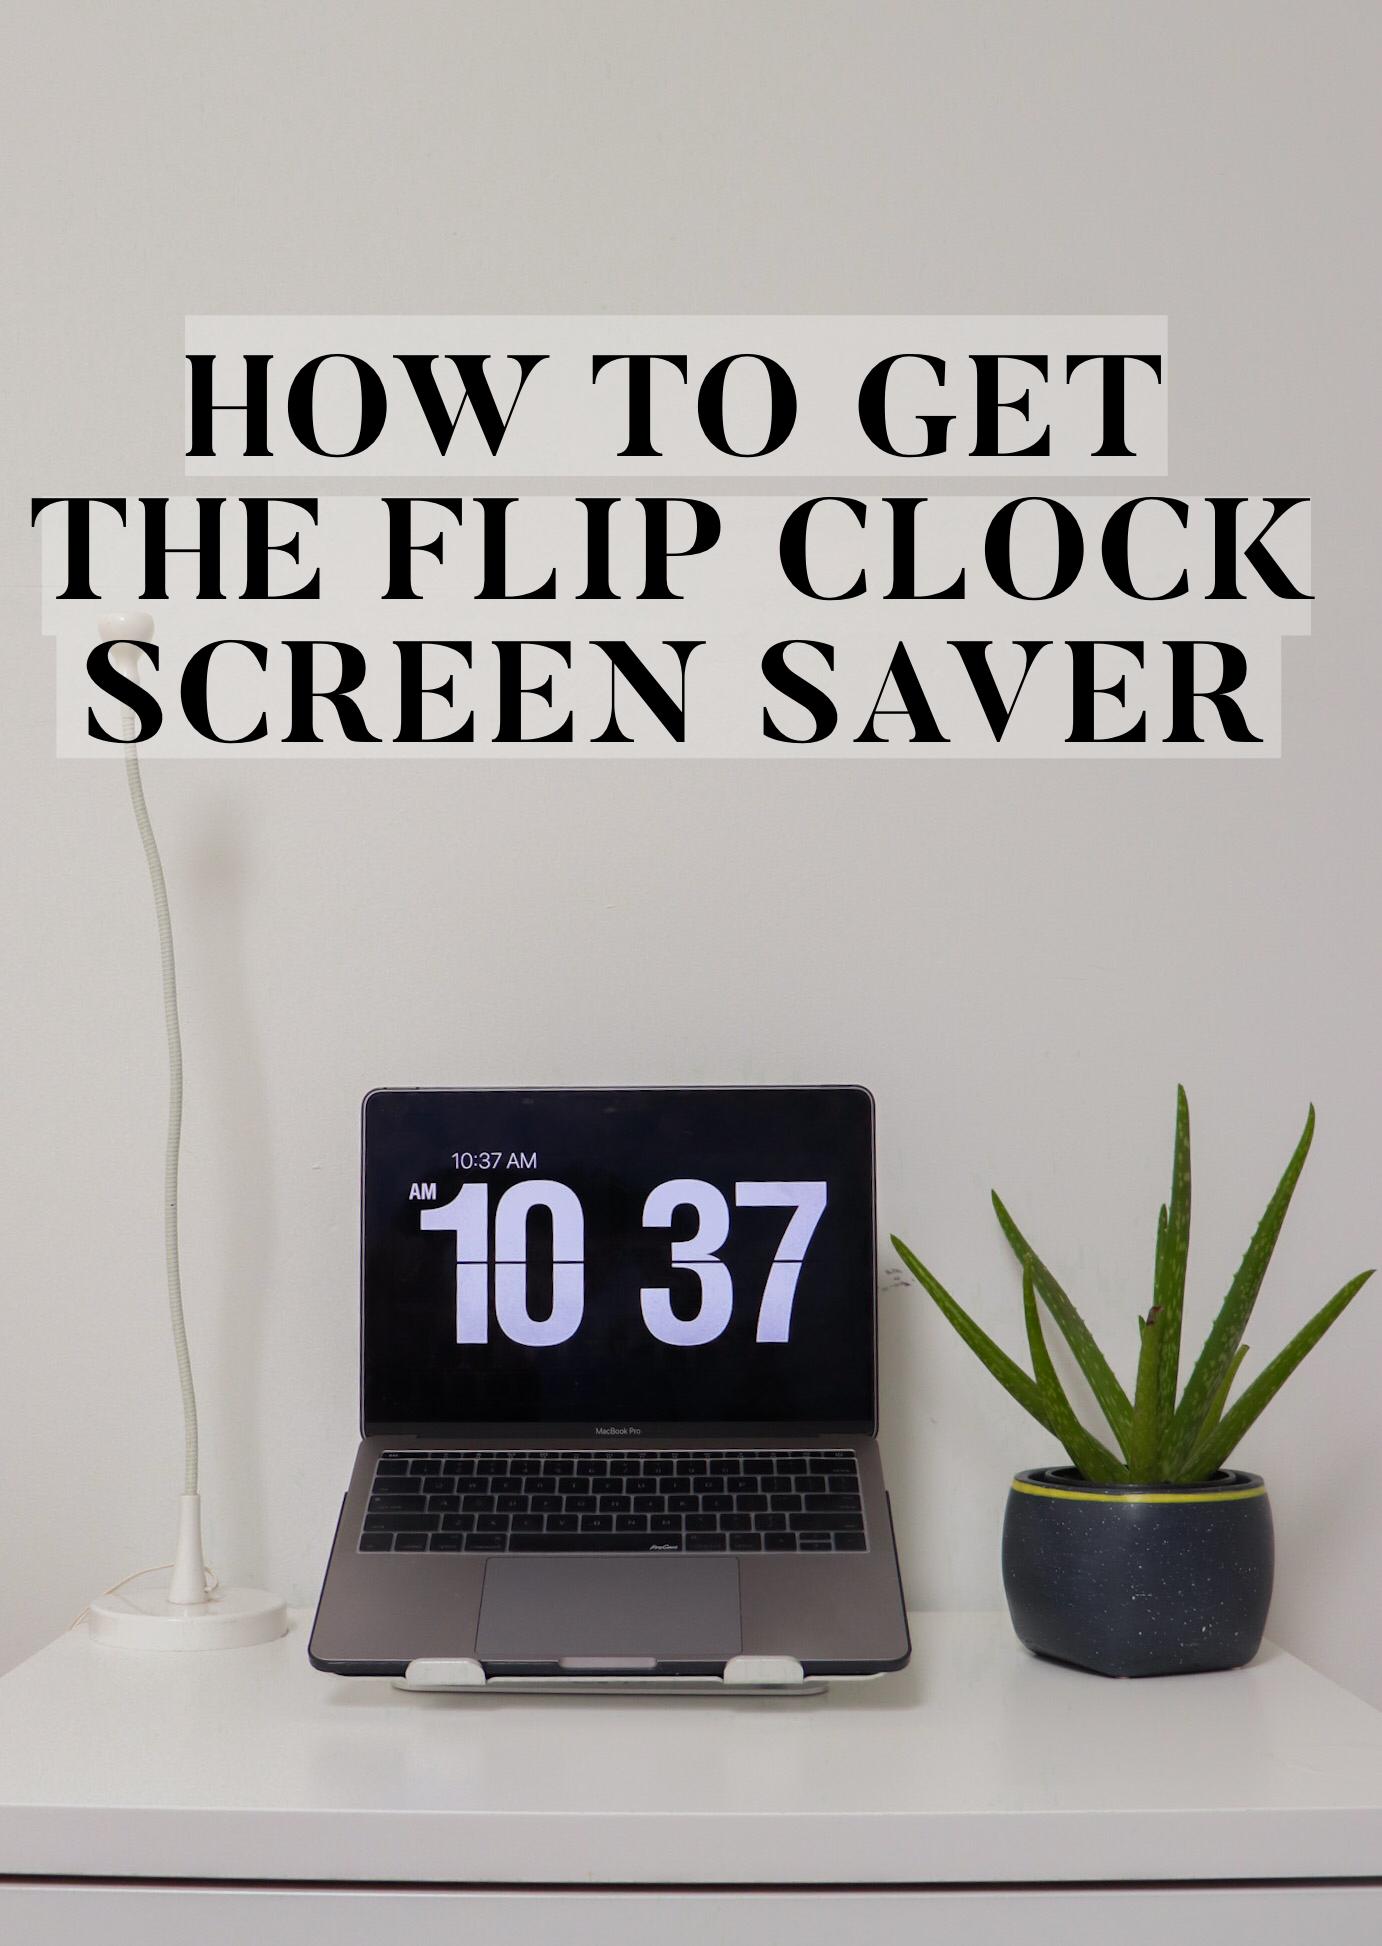 How To Get Flip Clock Screensaver On Macbook Air